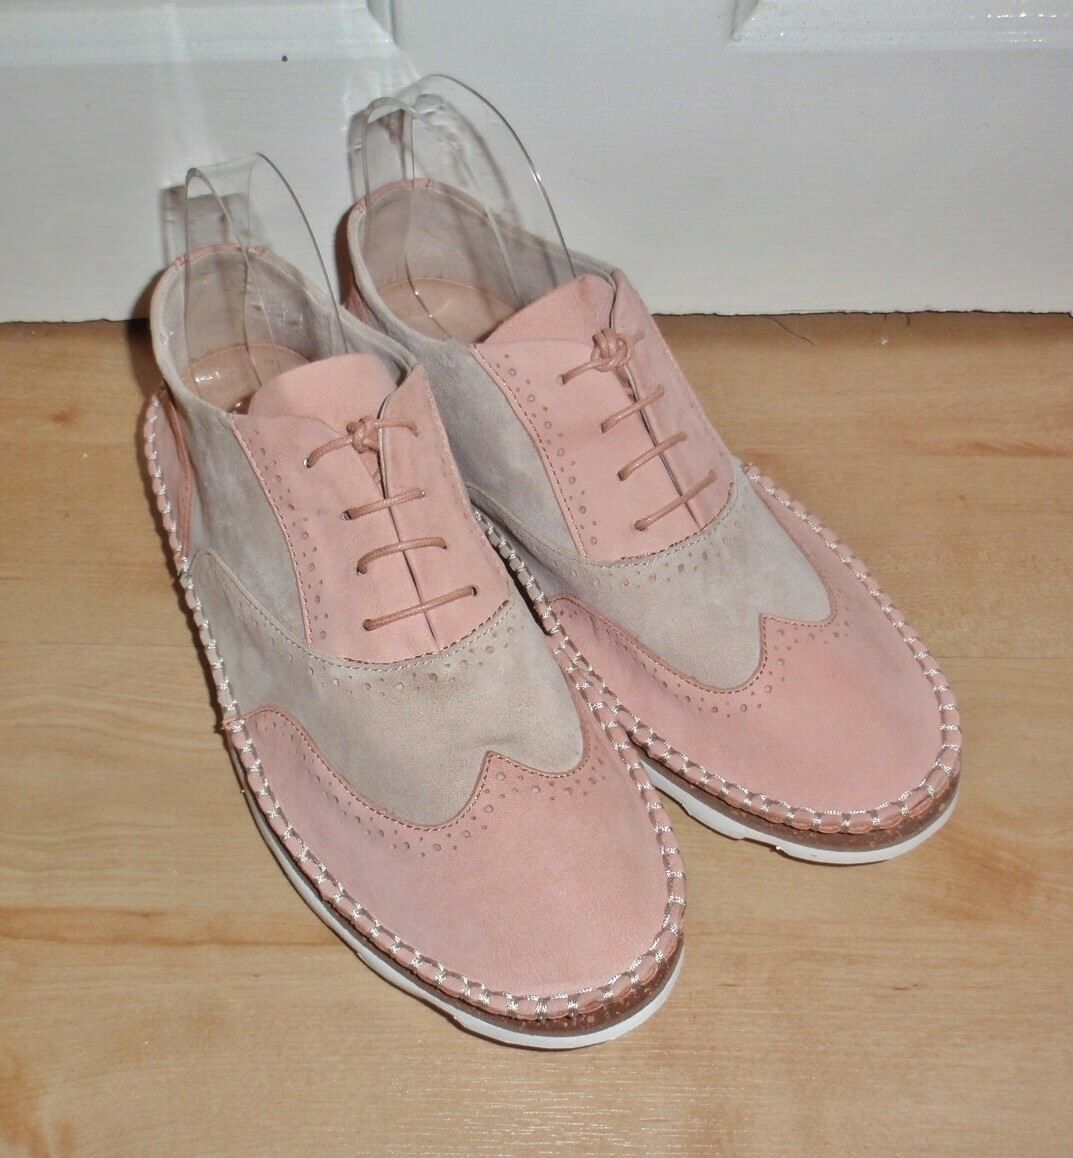 BNIB Clarks Narrative femmes DAMARA ROSE suede peach combi casual laced chaussures